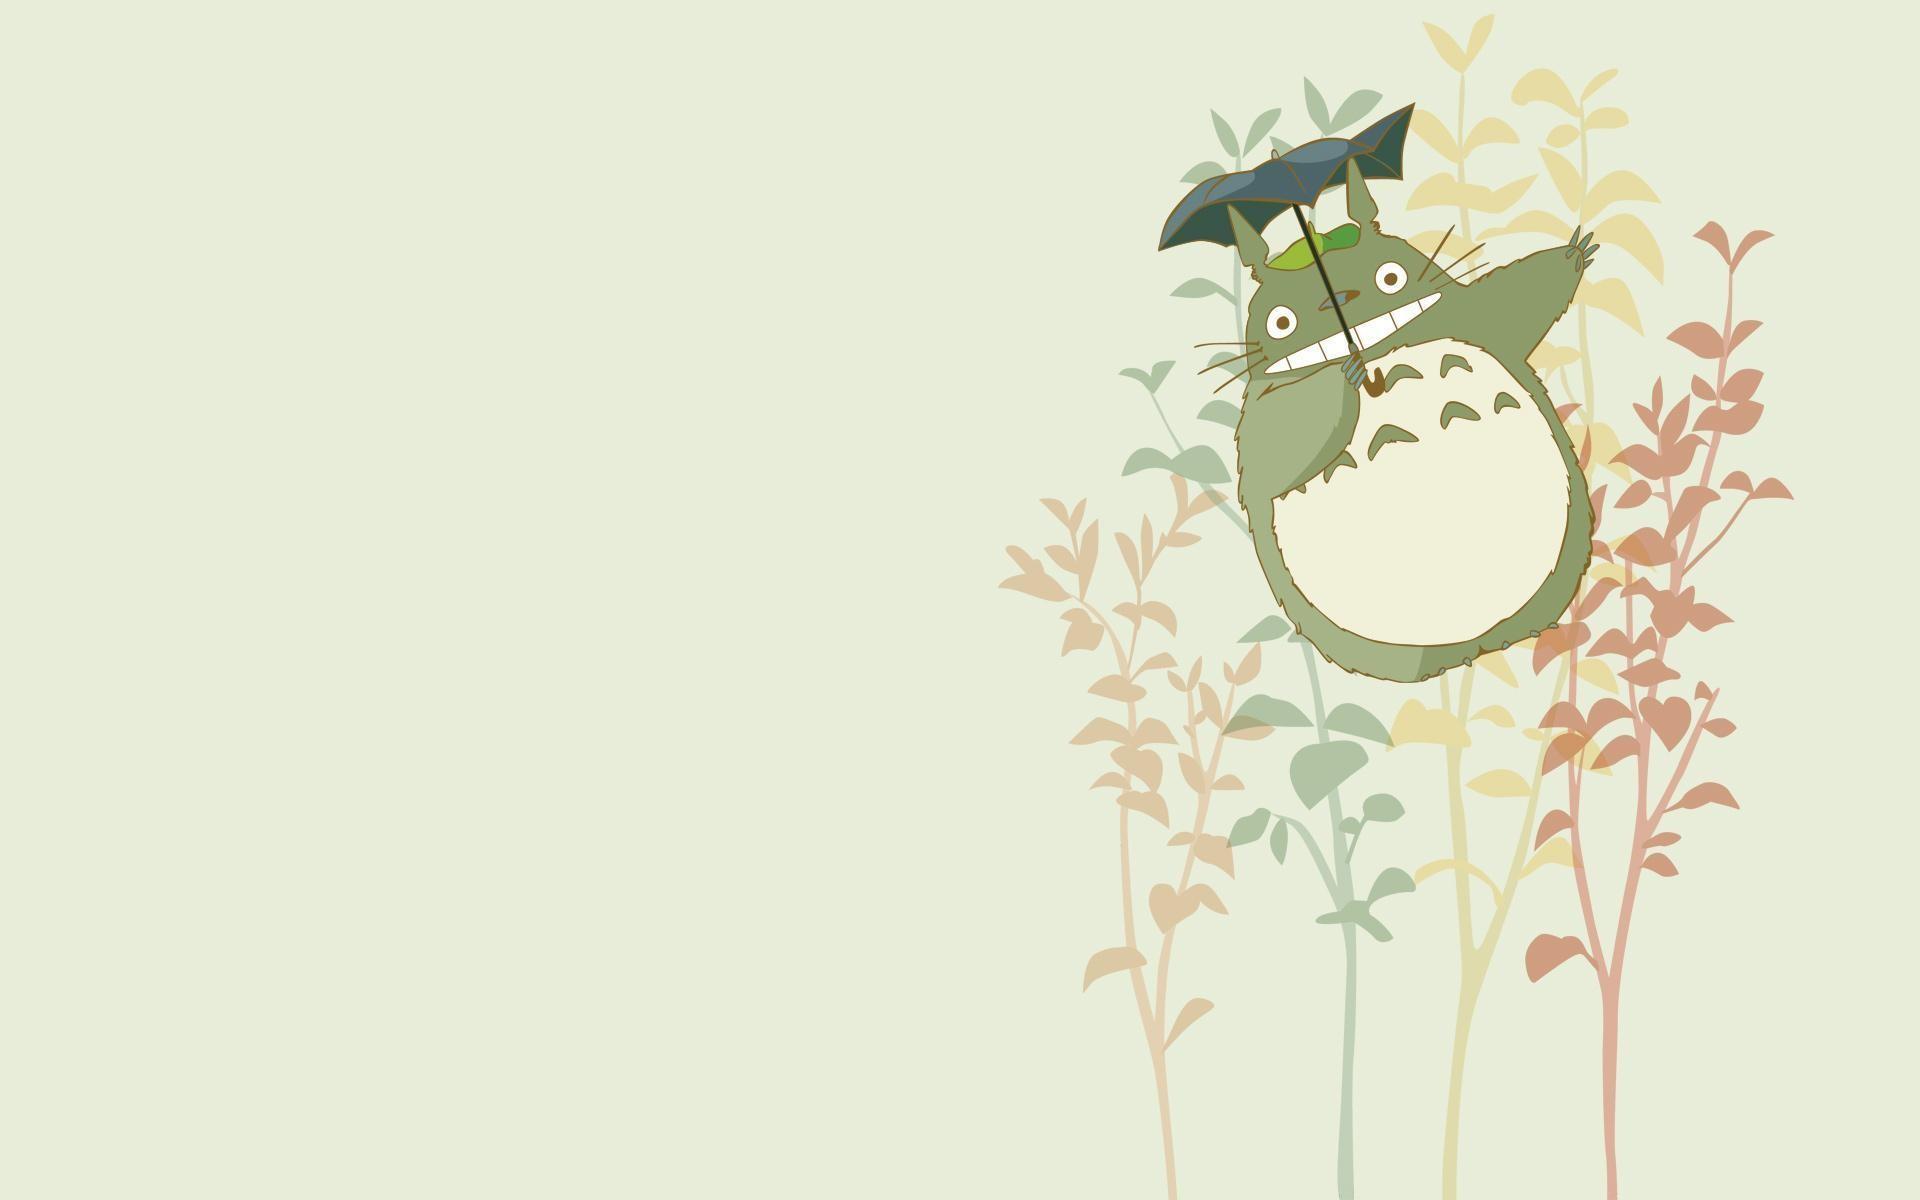 Totoro Wallpaper Hd 62 Images